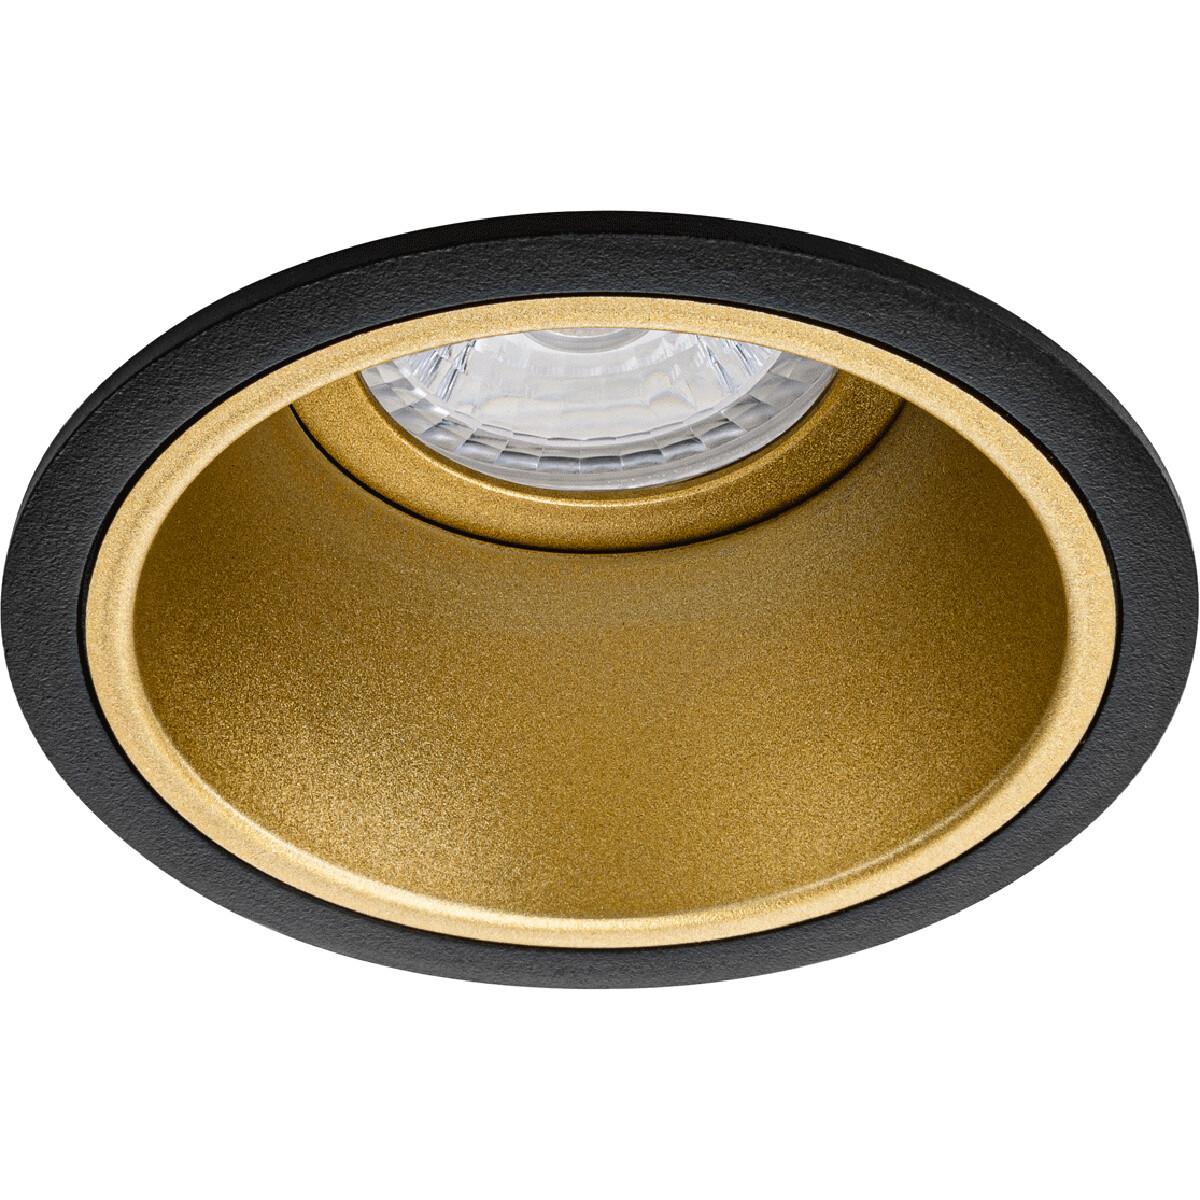 Spot Armatuur GU10 - Pragmi Minko Pro - Inbouw Rond - Mat Zwart/Goud - Aluminium - Verdiept - Ø90mm